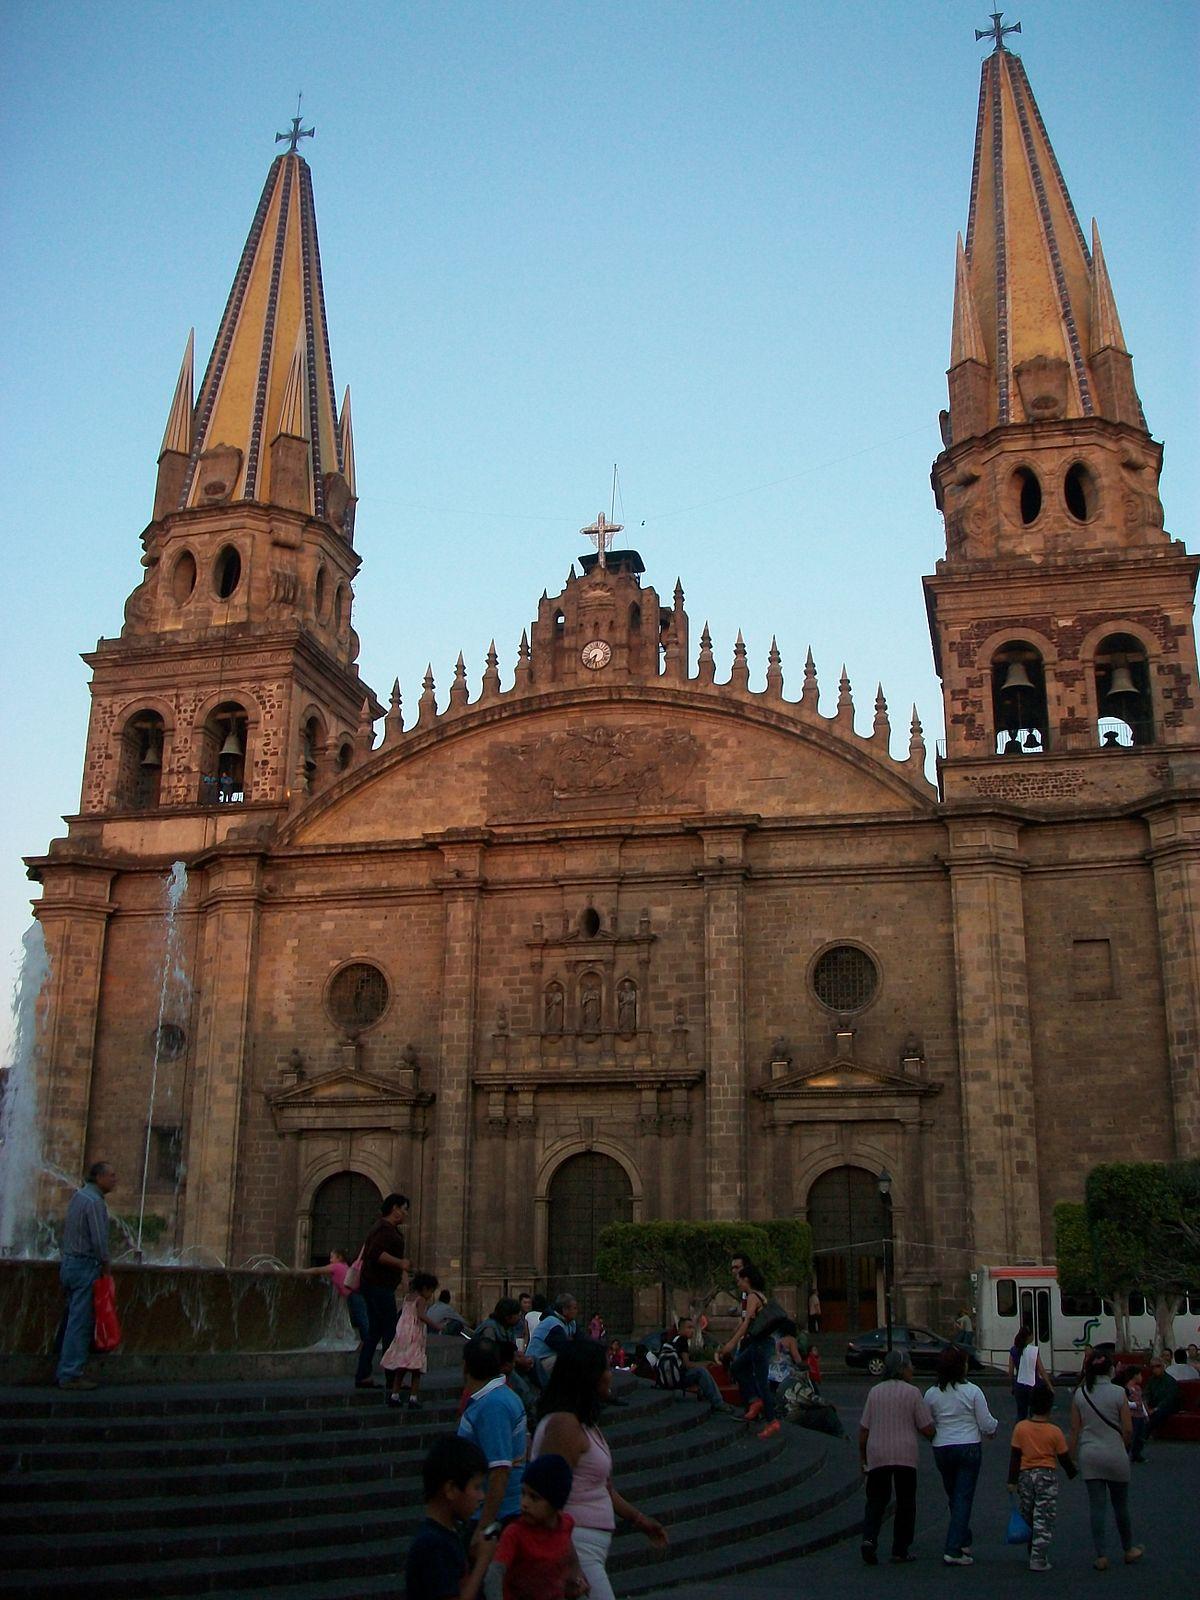 Guadalajara Cathedral - Wikipedia